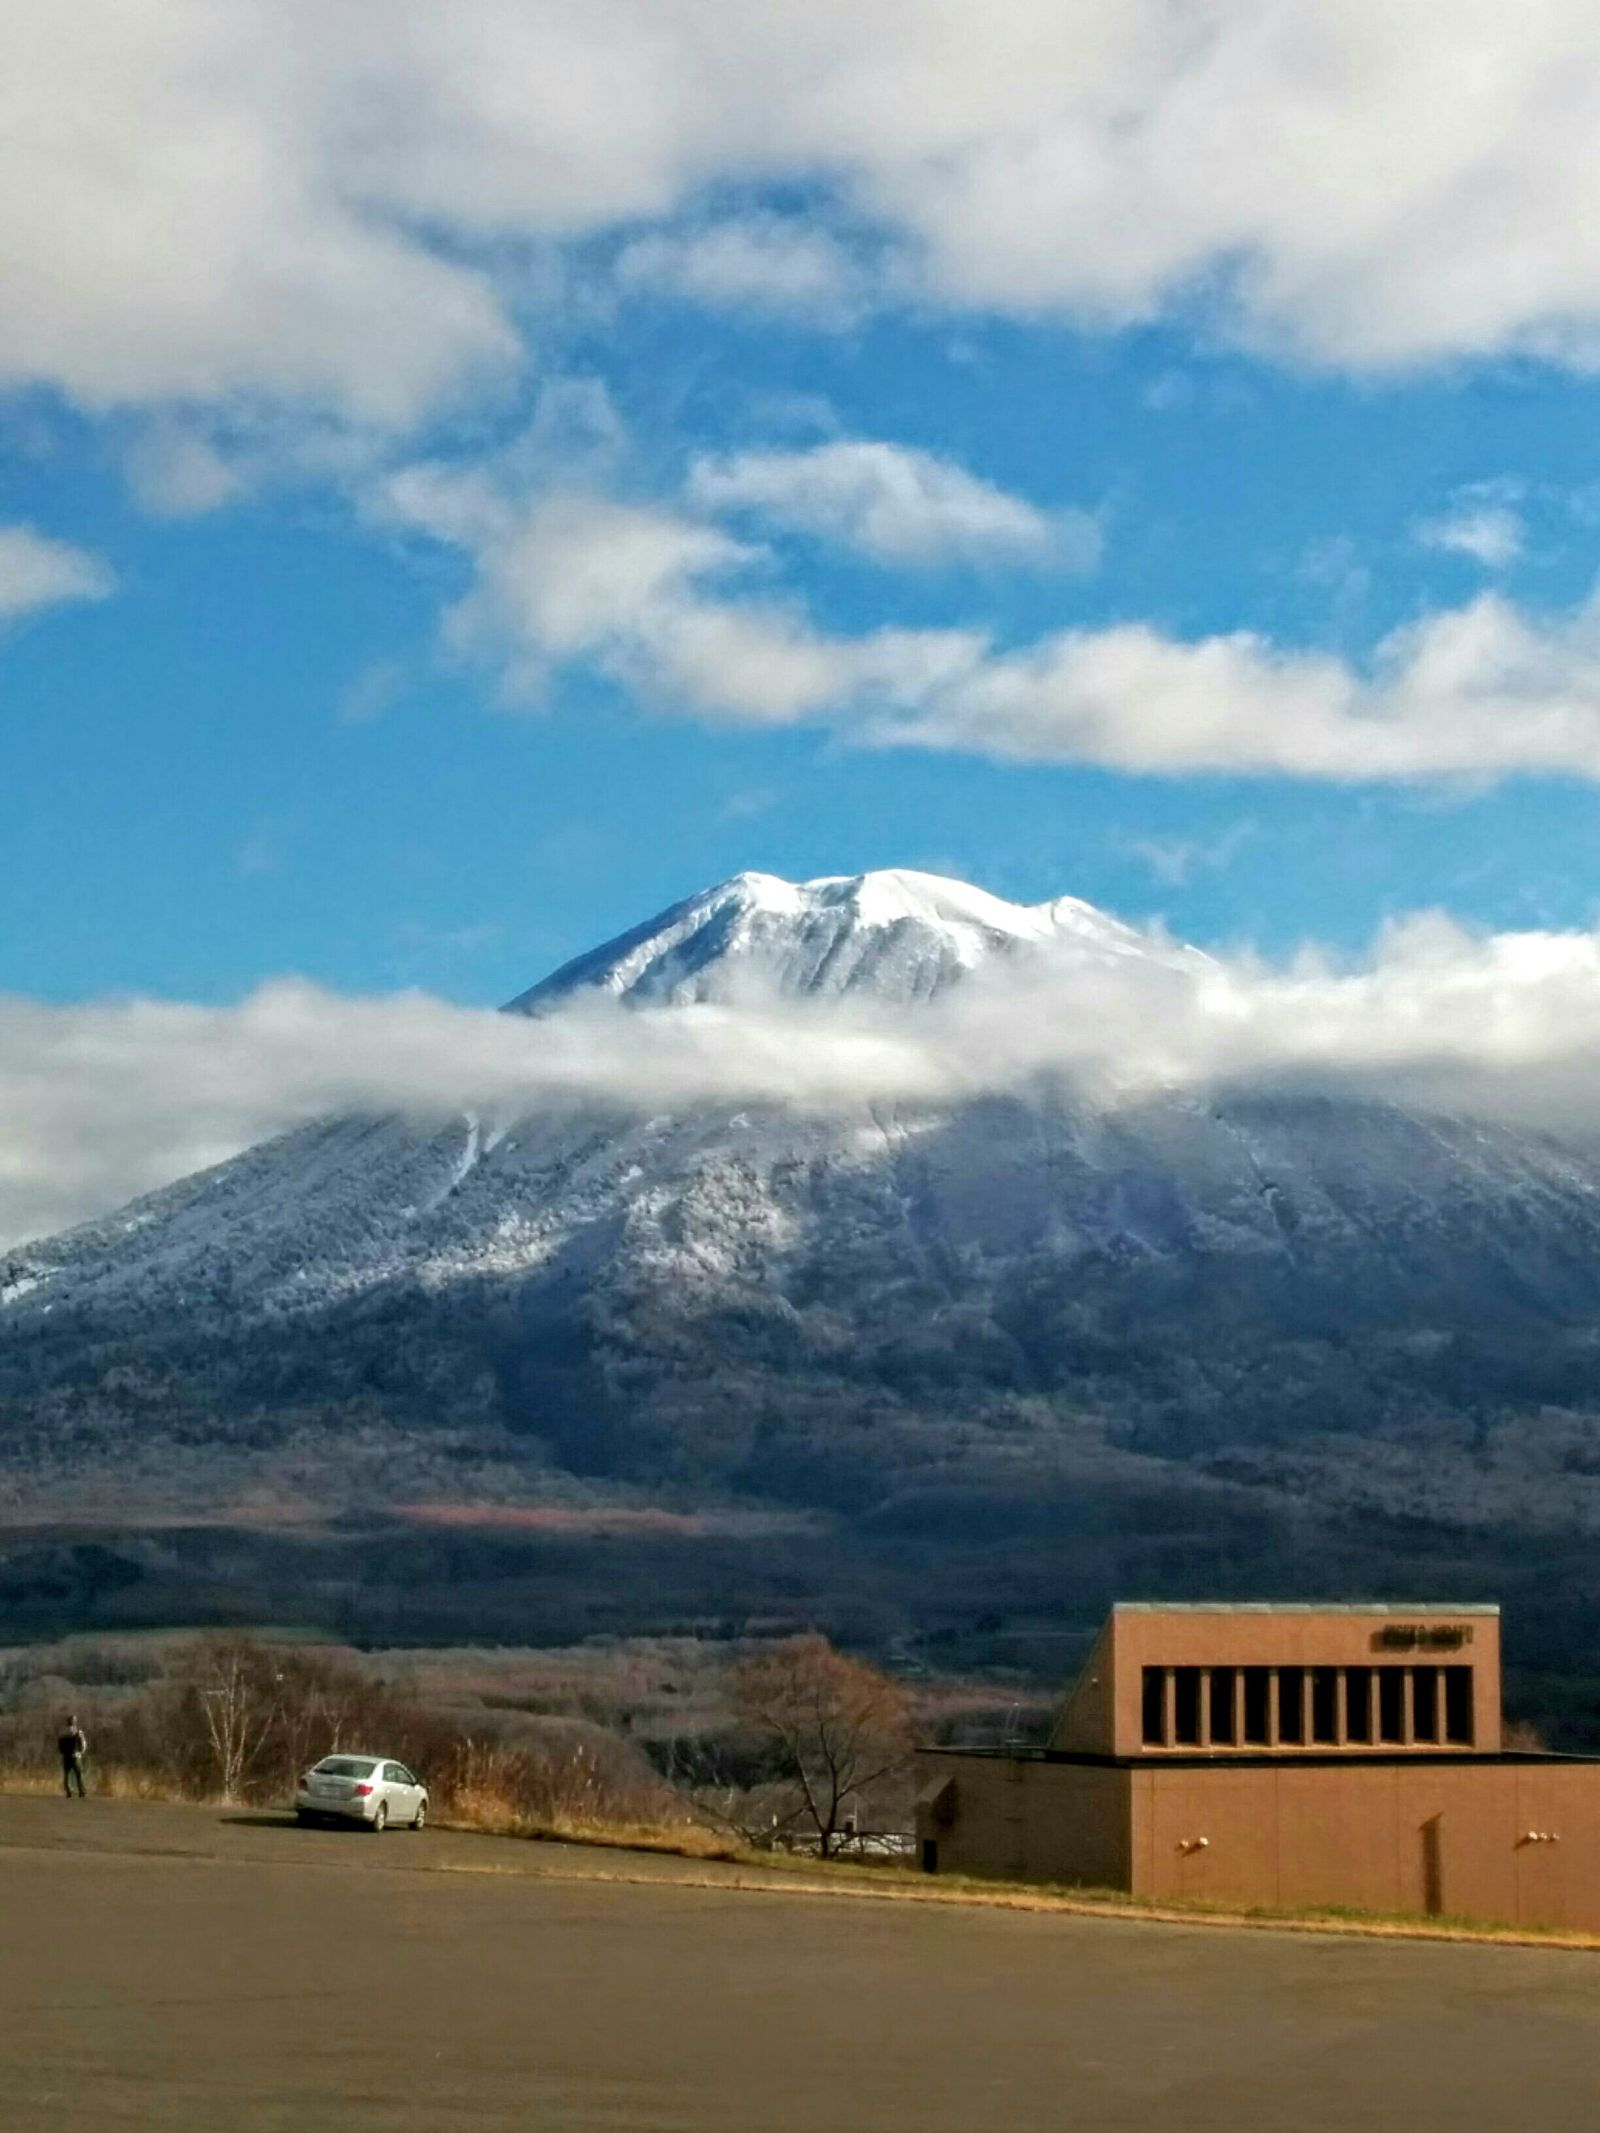 【羊蹄山】蝦夷富士・羊蹄山観光案内です。